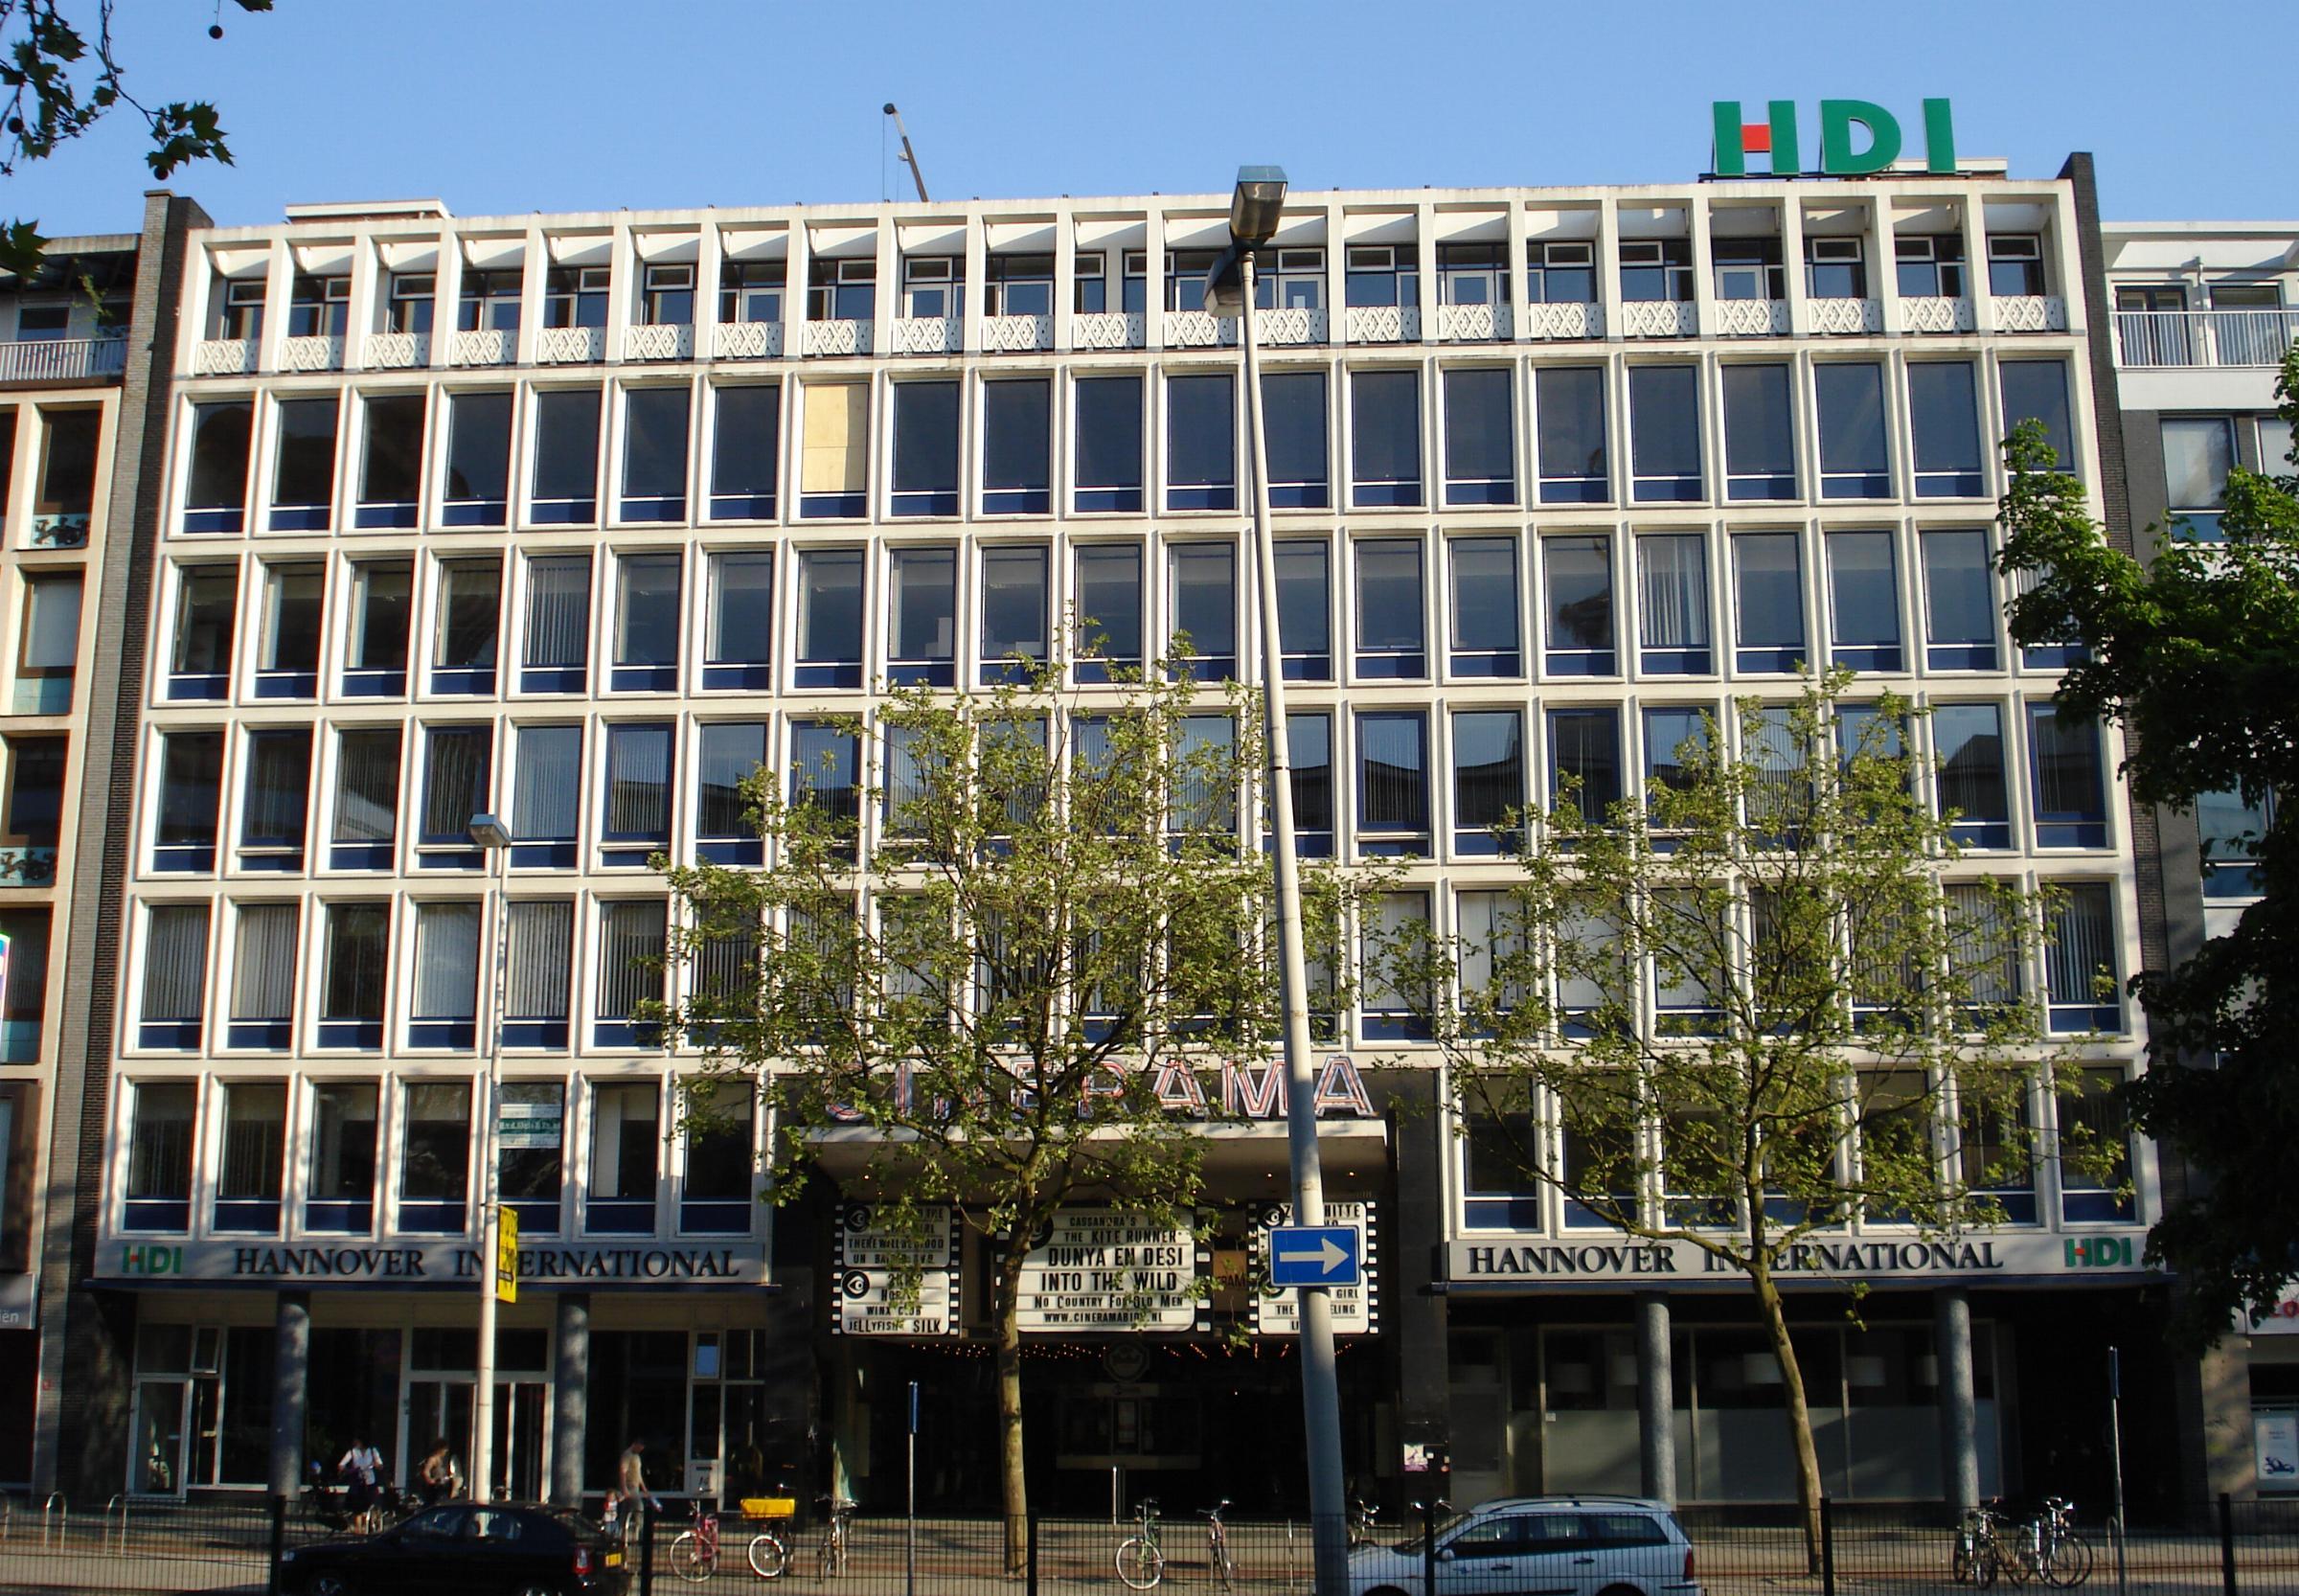 File:Rotterdam westblaak14-22.jpg